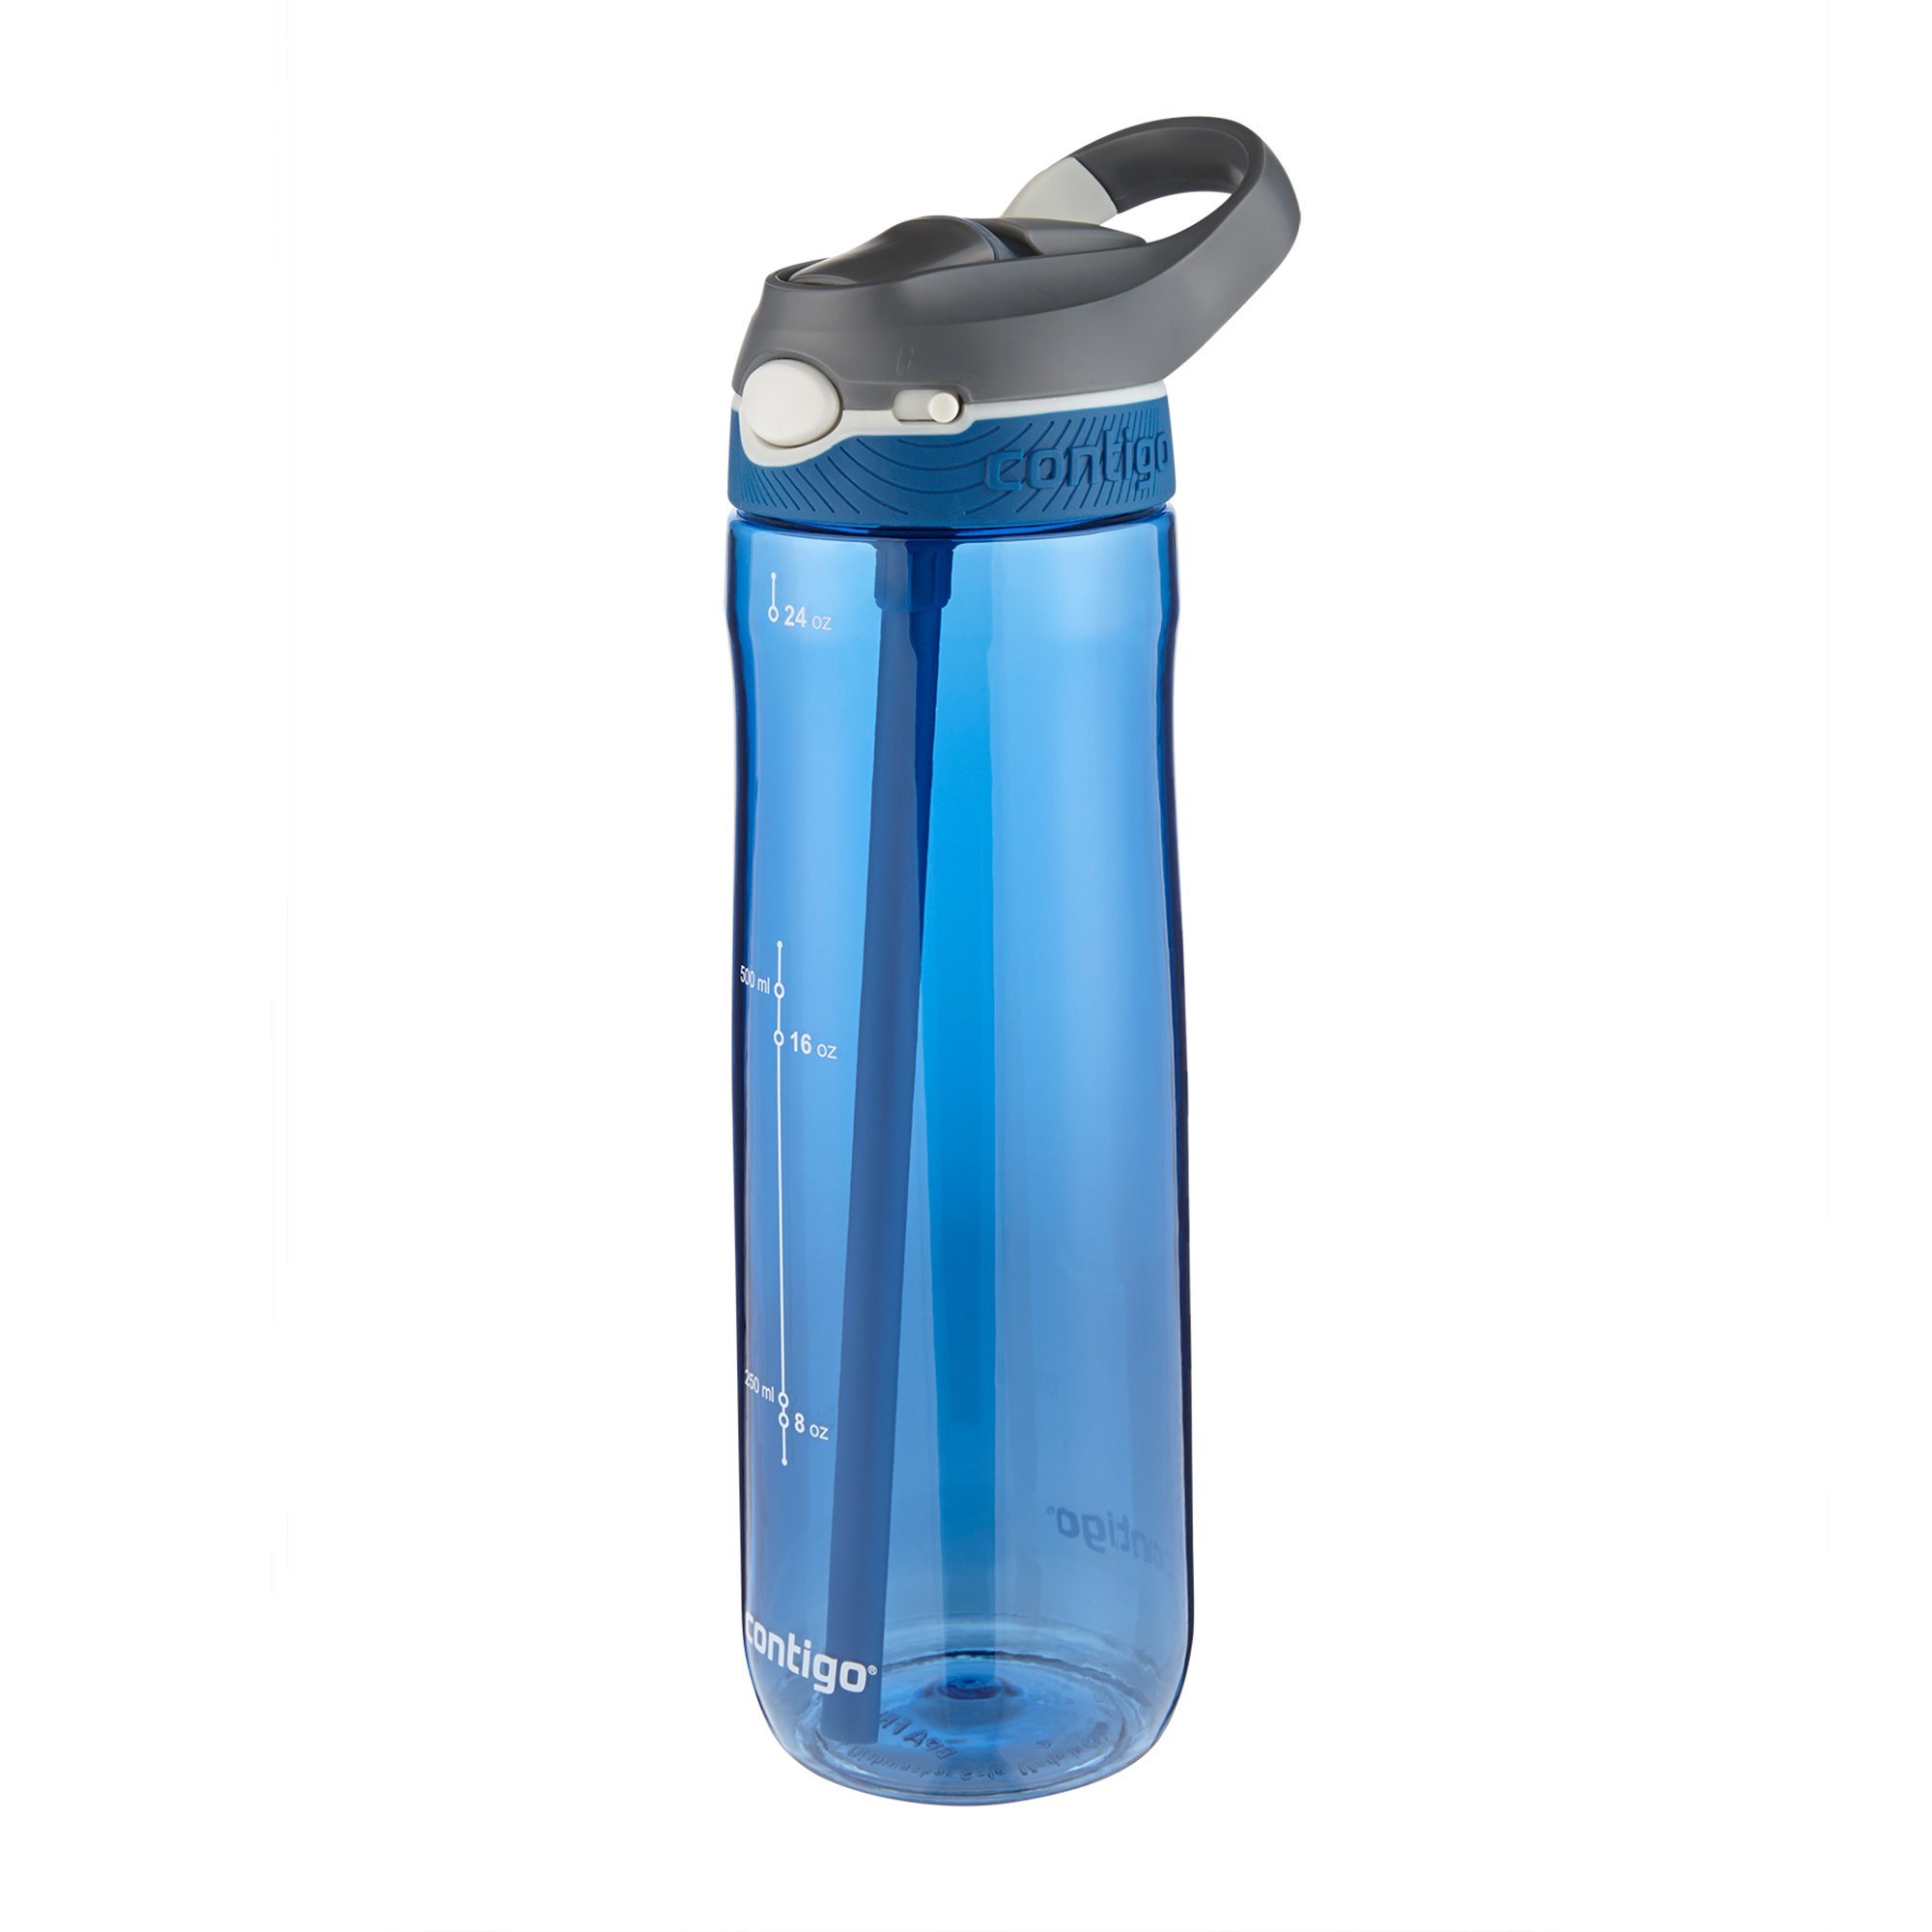 Contigo AUTOSPOUT Straw Ashland Water Bottle, 24 oz, Stormy Weather/Vibrant Lime/Monaco, 3-pack by Contigo (Image #4)